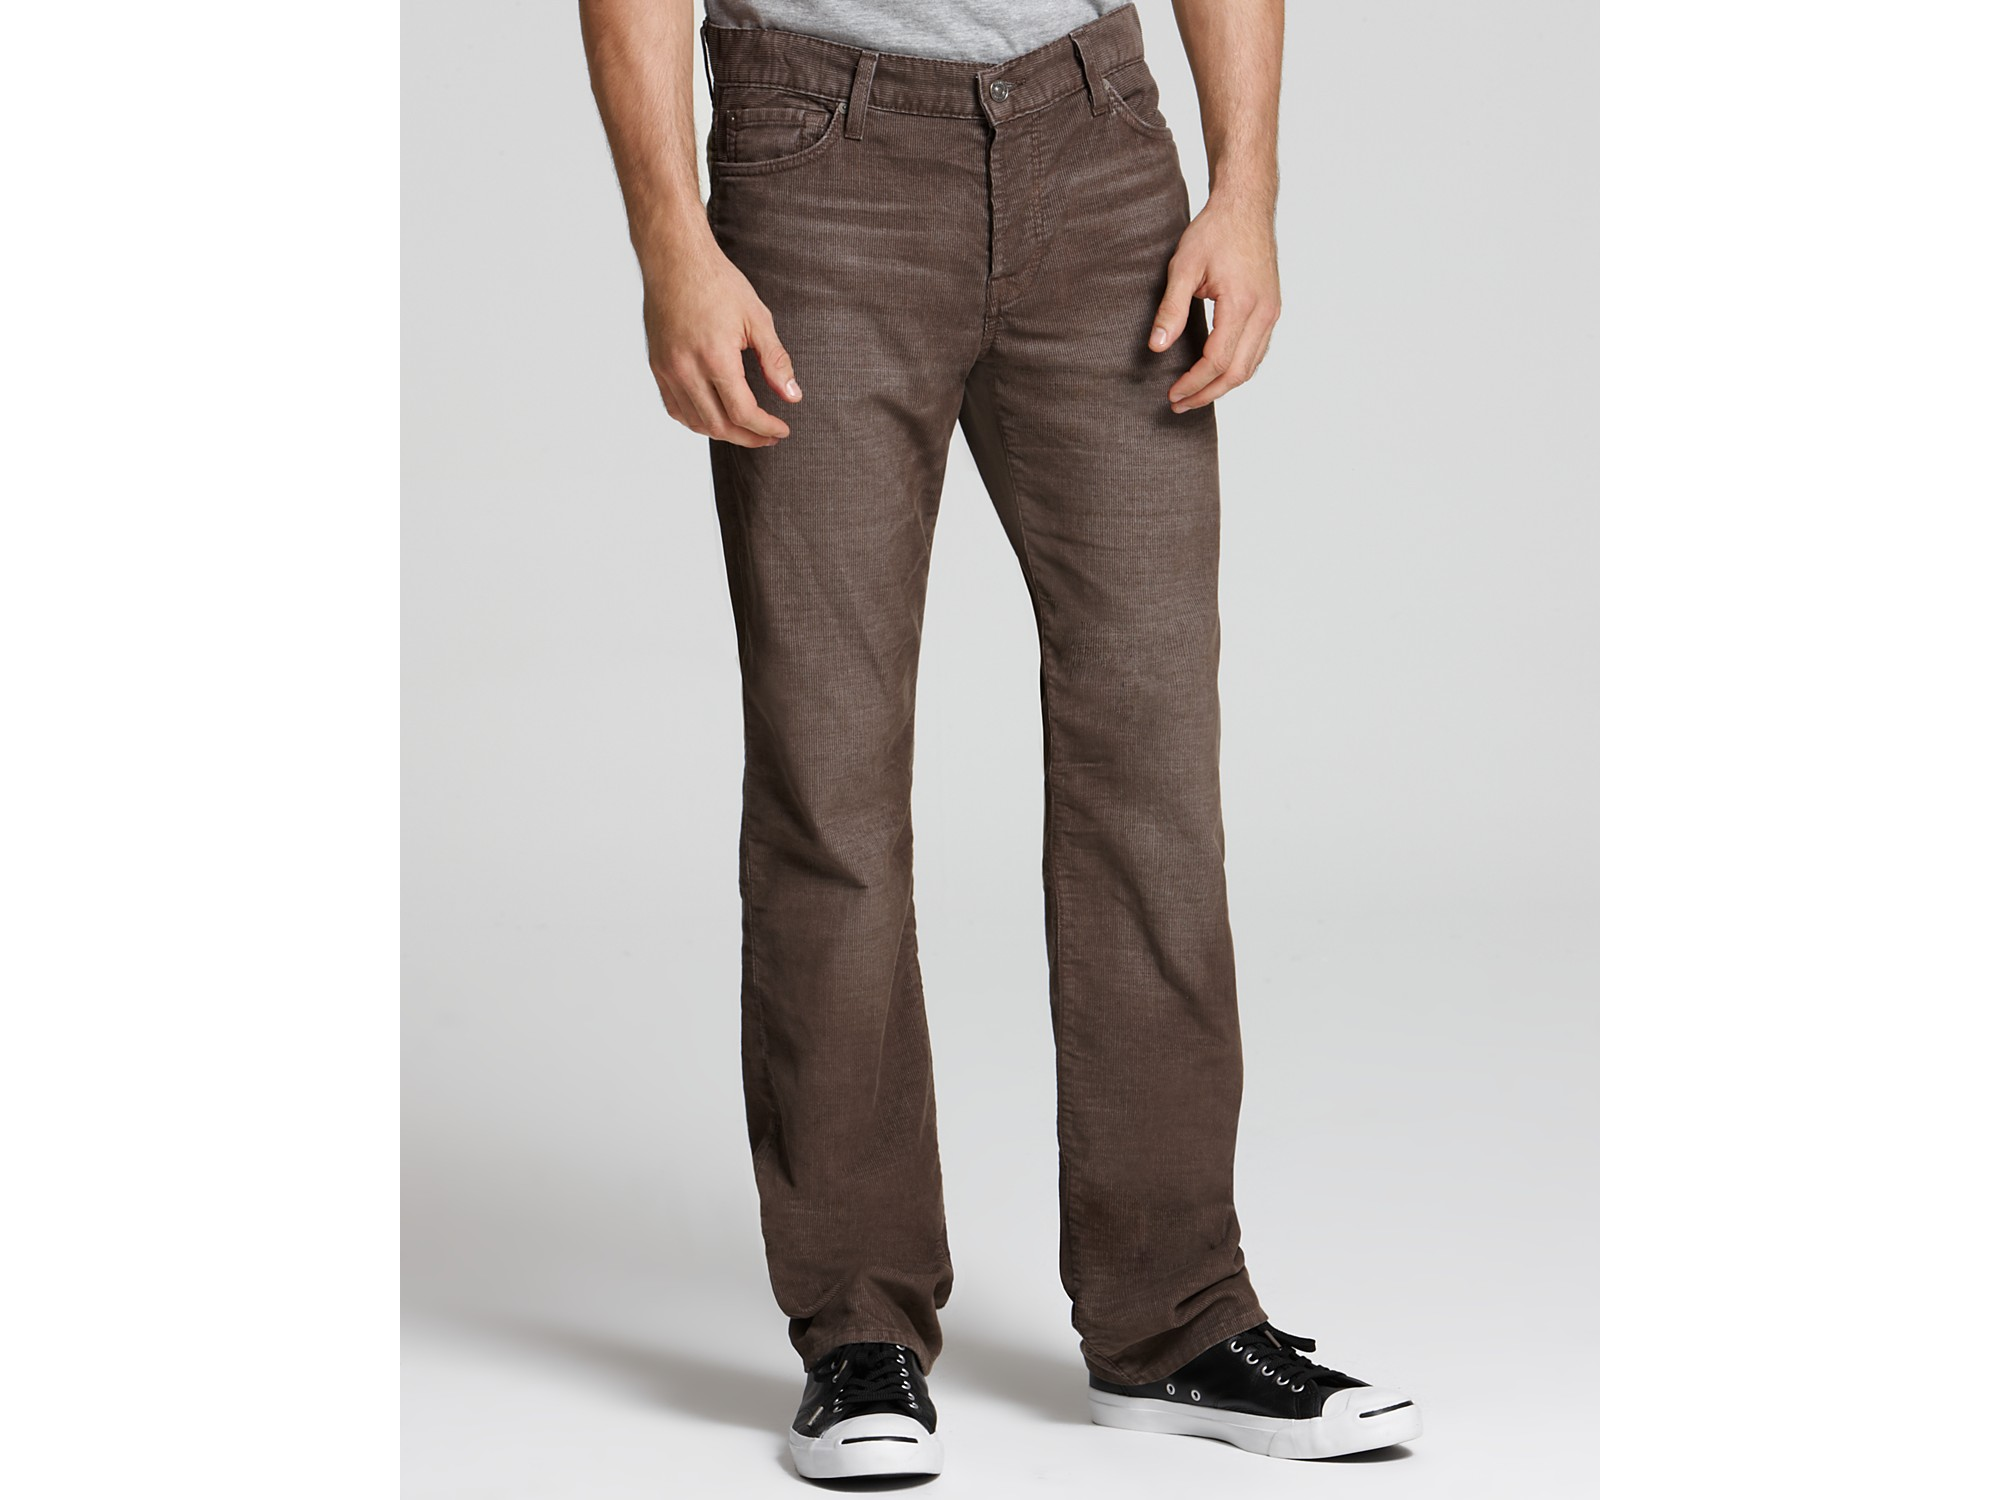 How To Wash Corduroy Pants - White Pants 2016